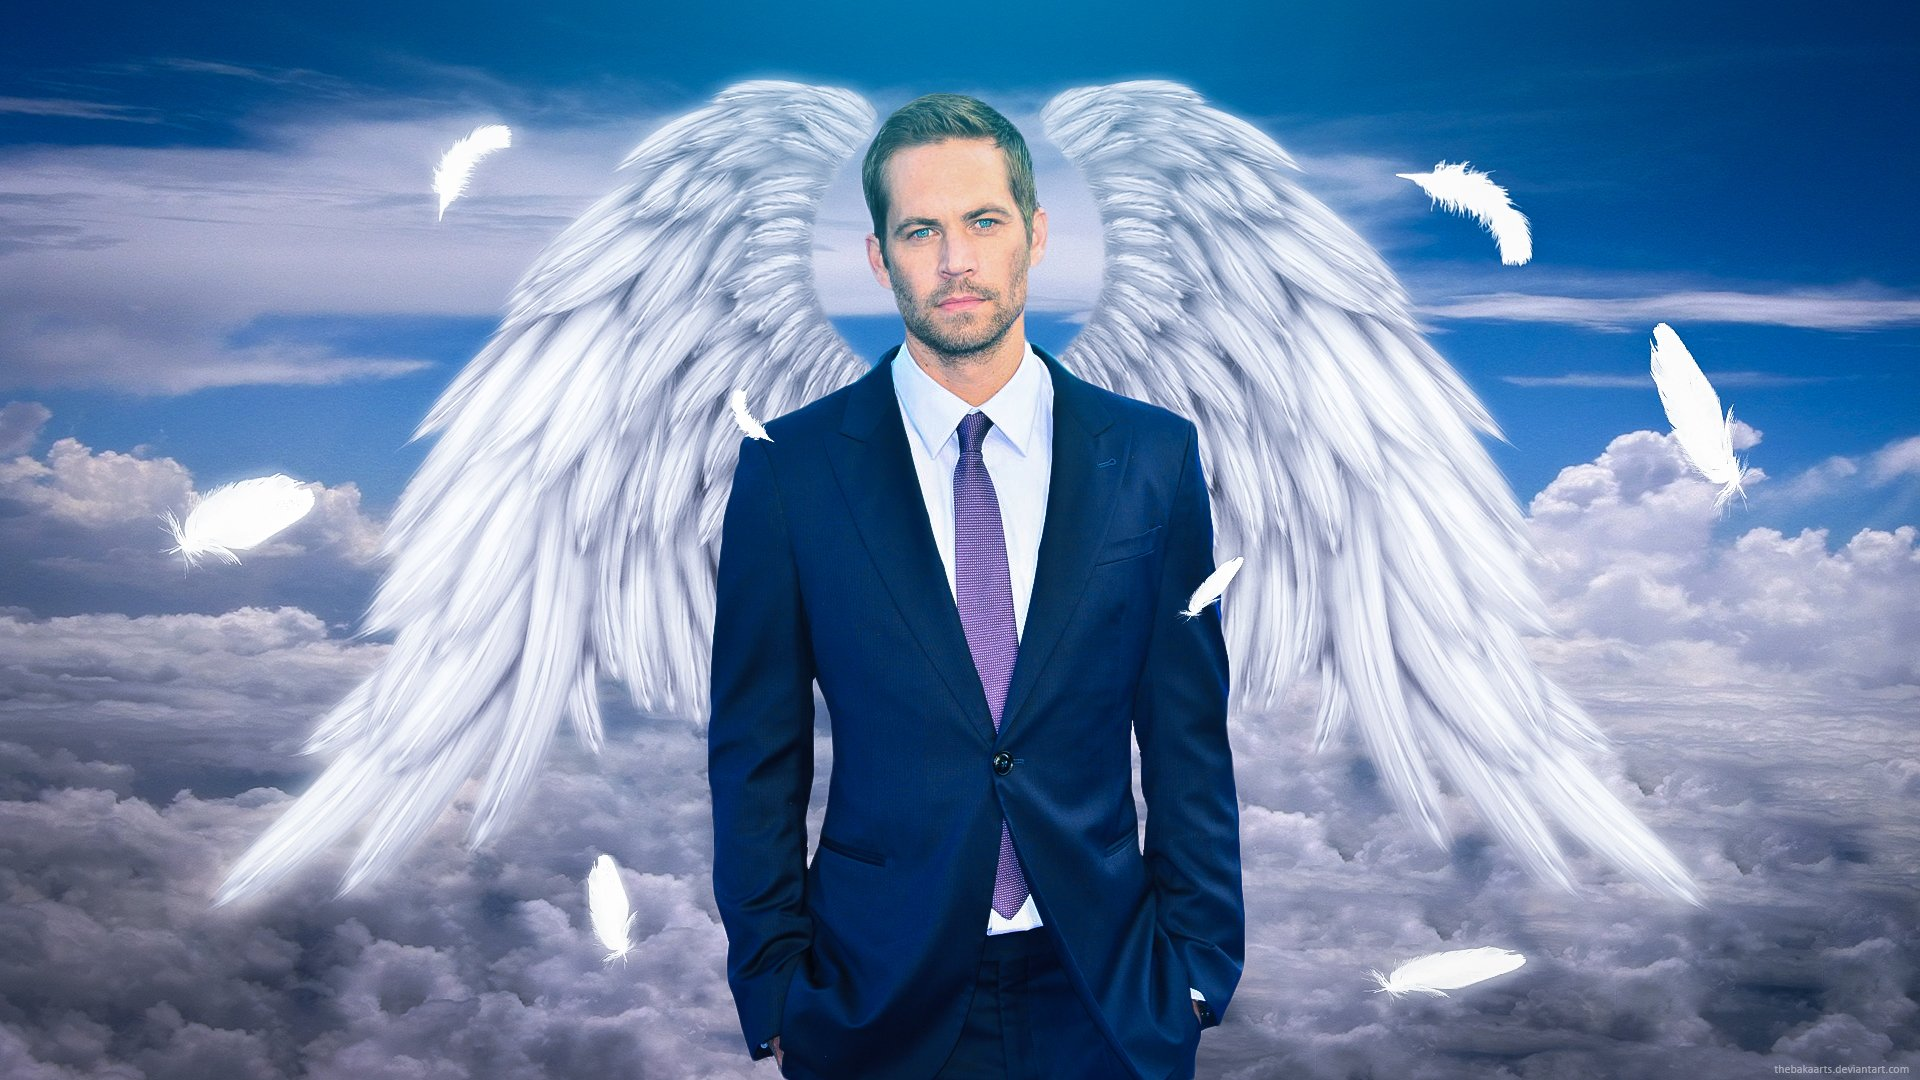 Картинки мужчины с крыльями ангела